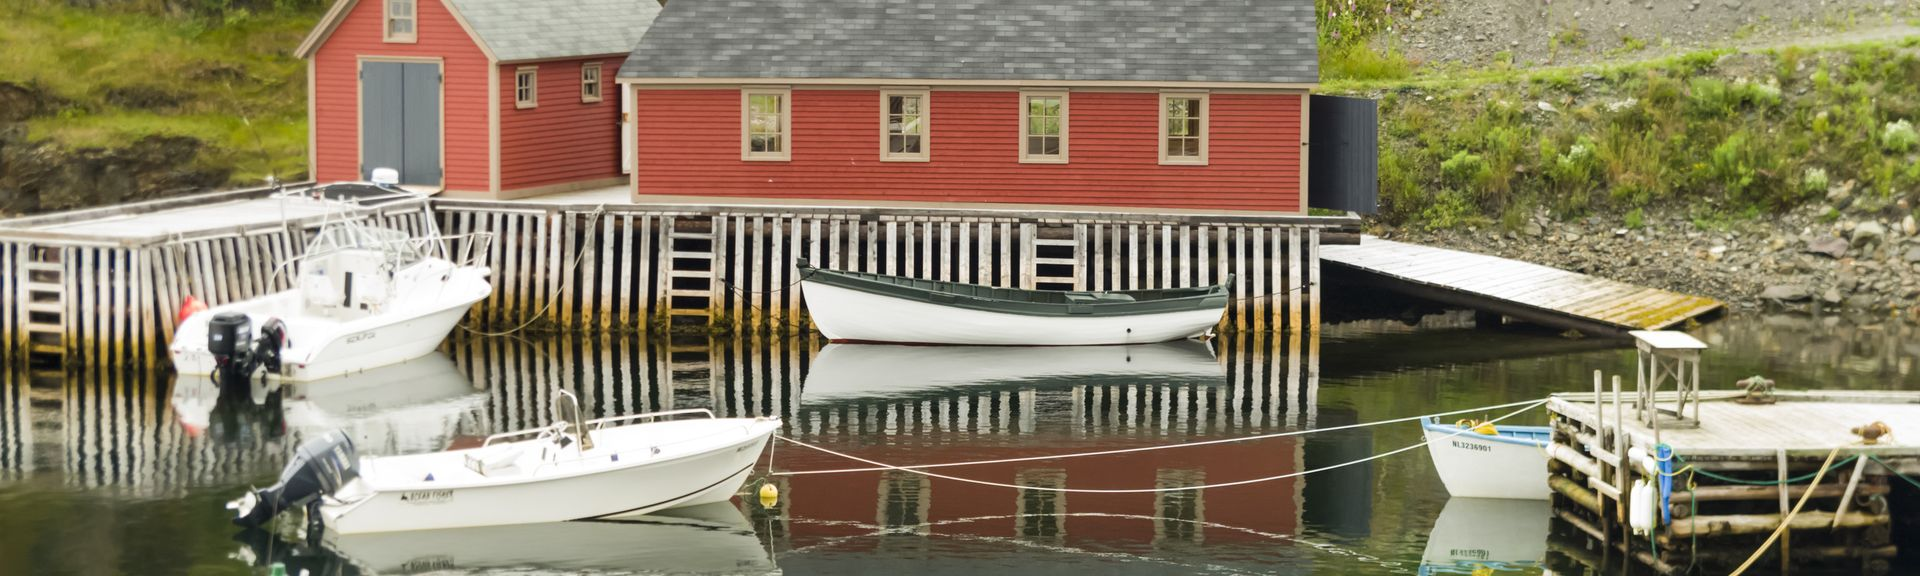 Trinity Bay, Division No. 1, Subd. F, NL, Canada